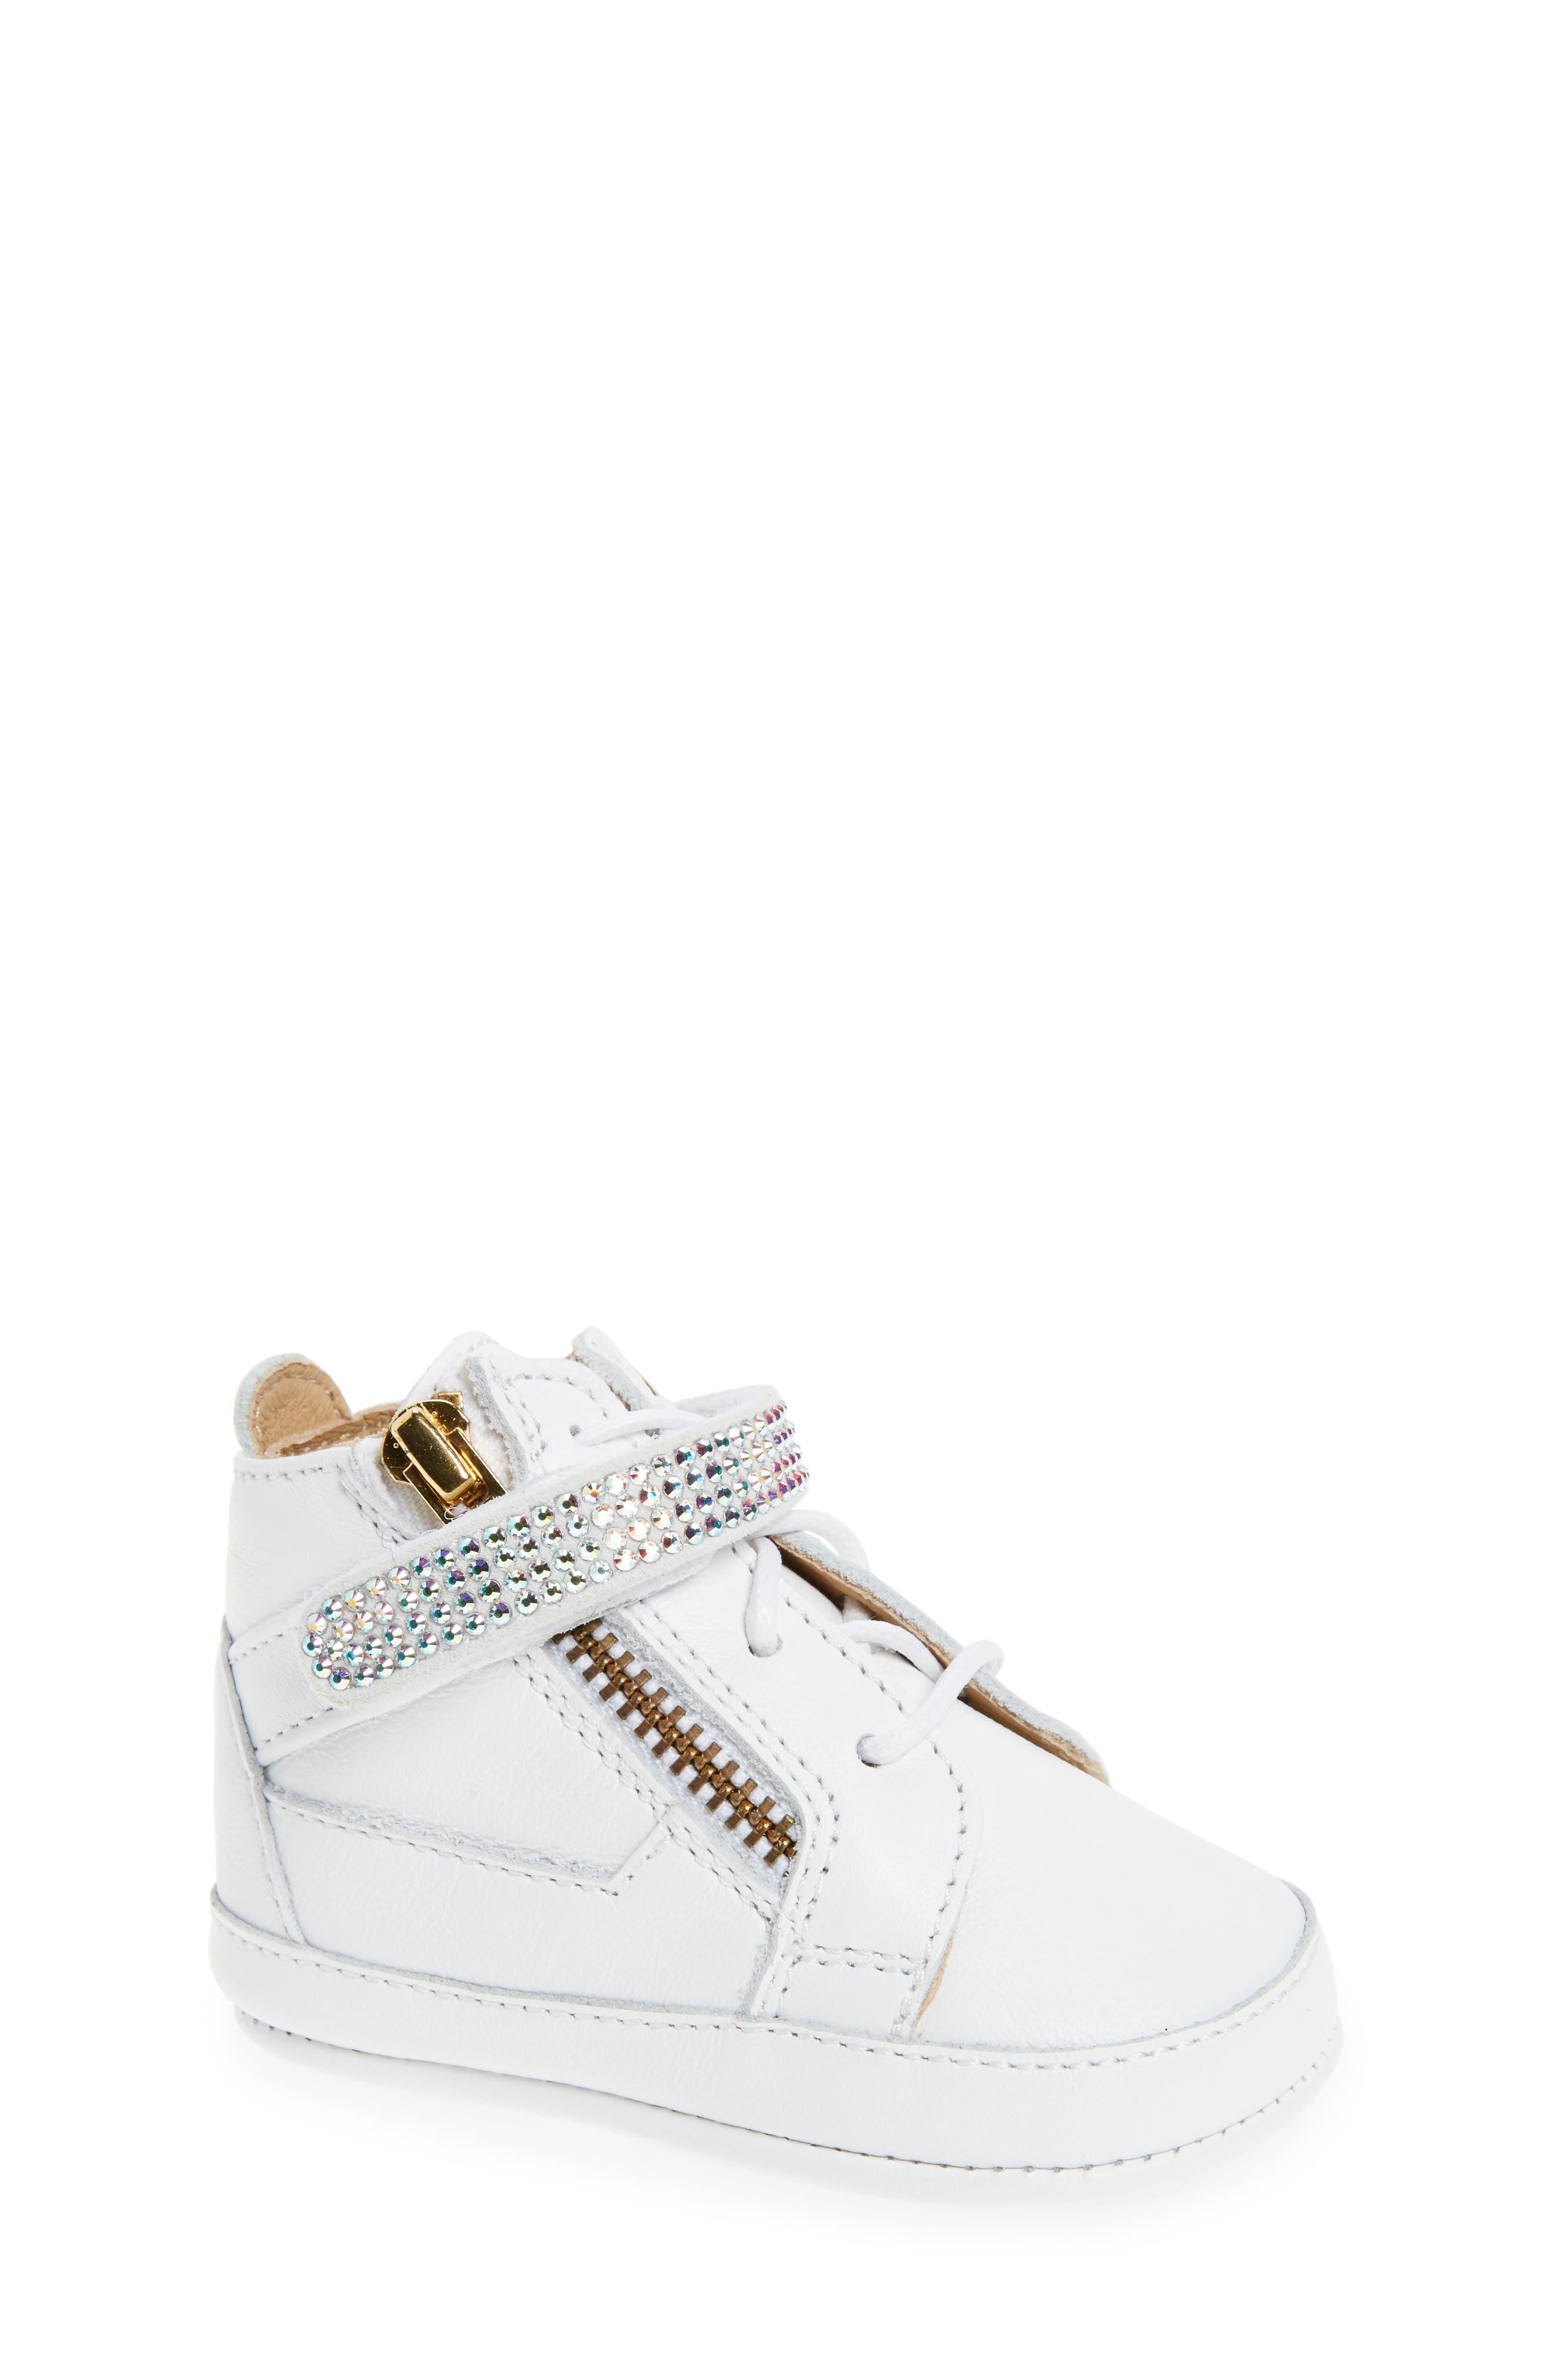 Giuseppe Zanotti Sobja Embellished High Top Crib Shoe (Baby)